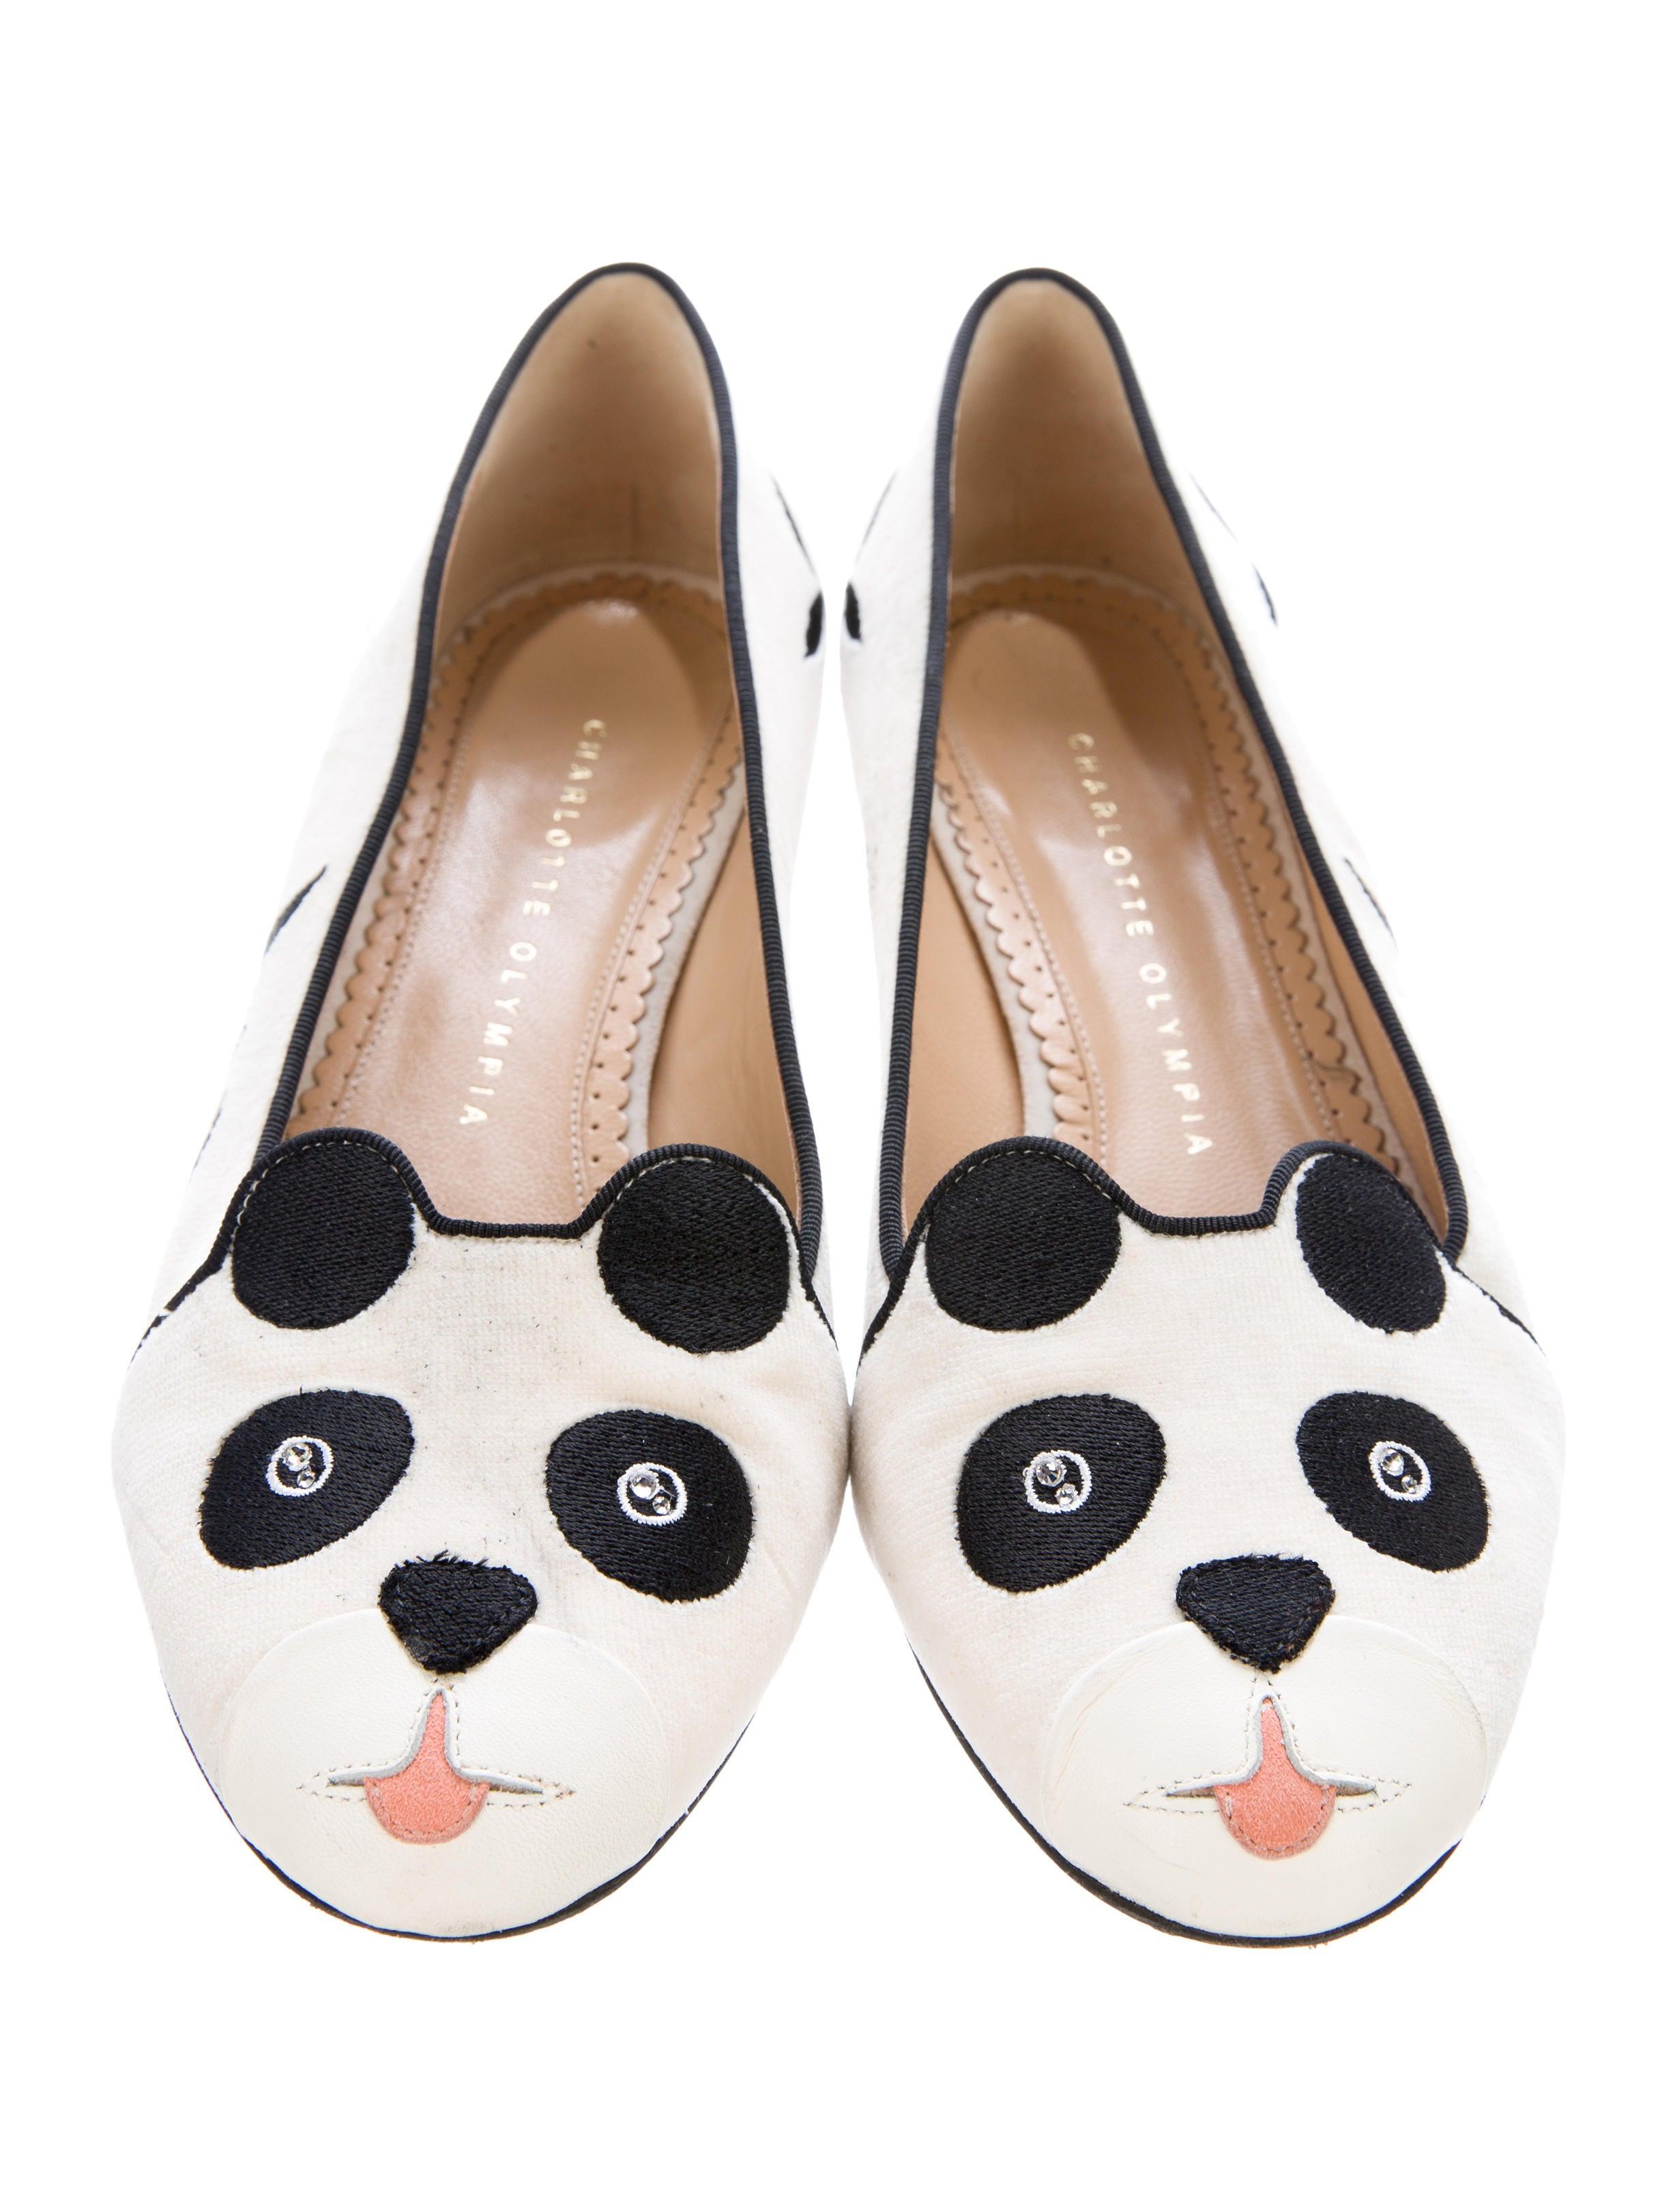 Charlotte Olympia Velvet Panda Flats find great sale online ZuAimh